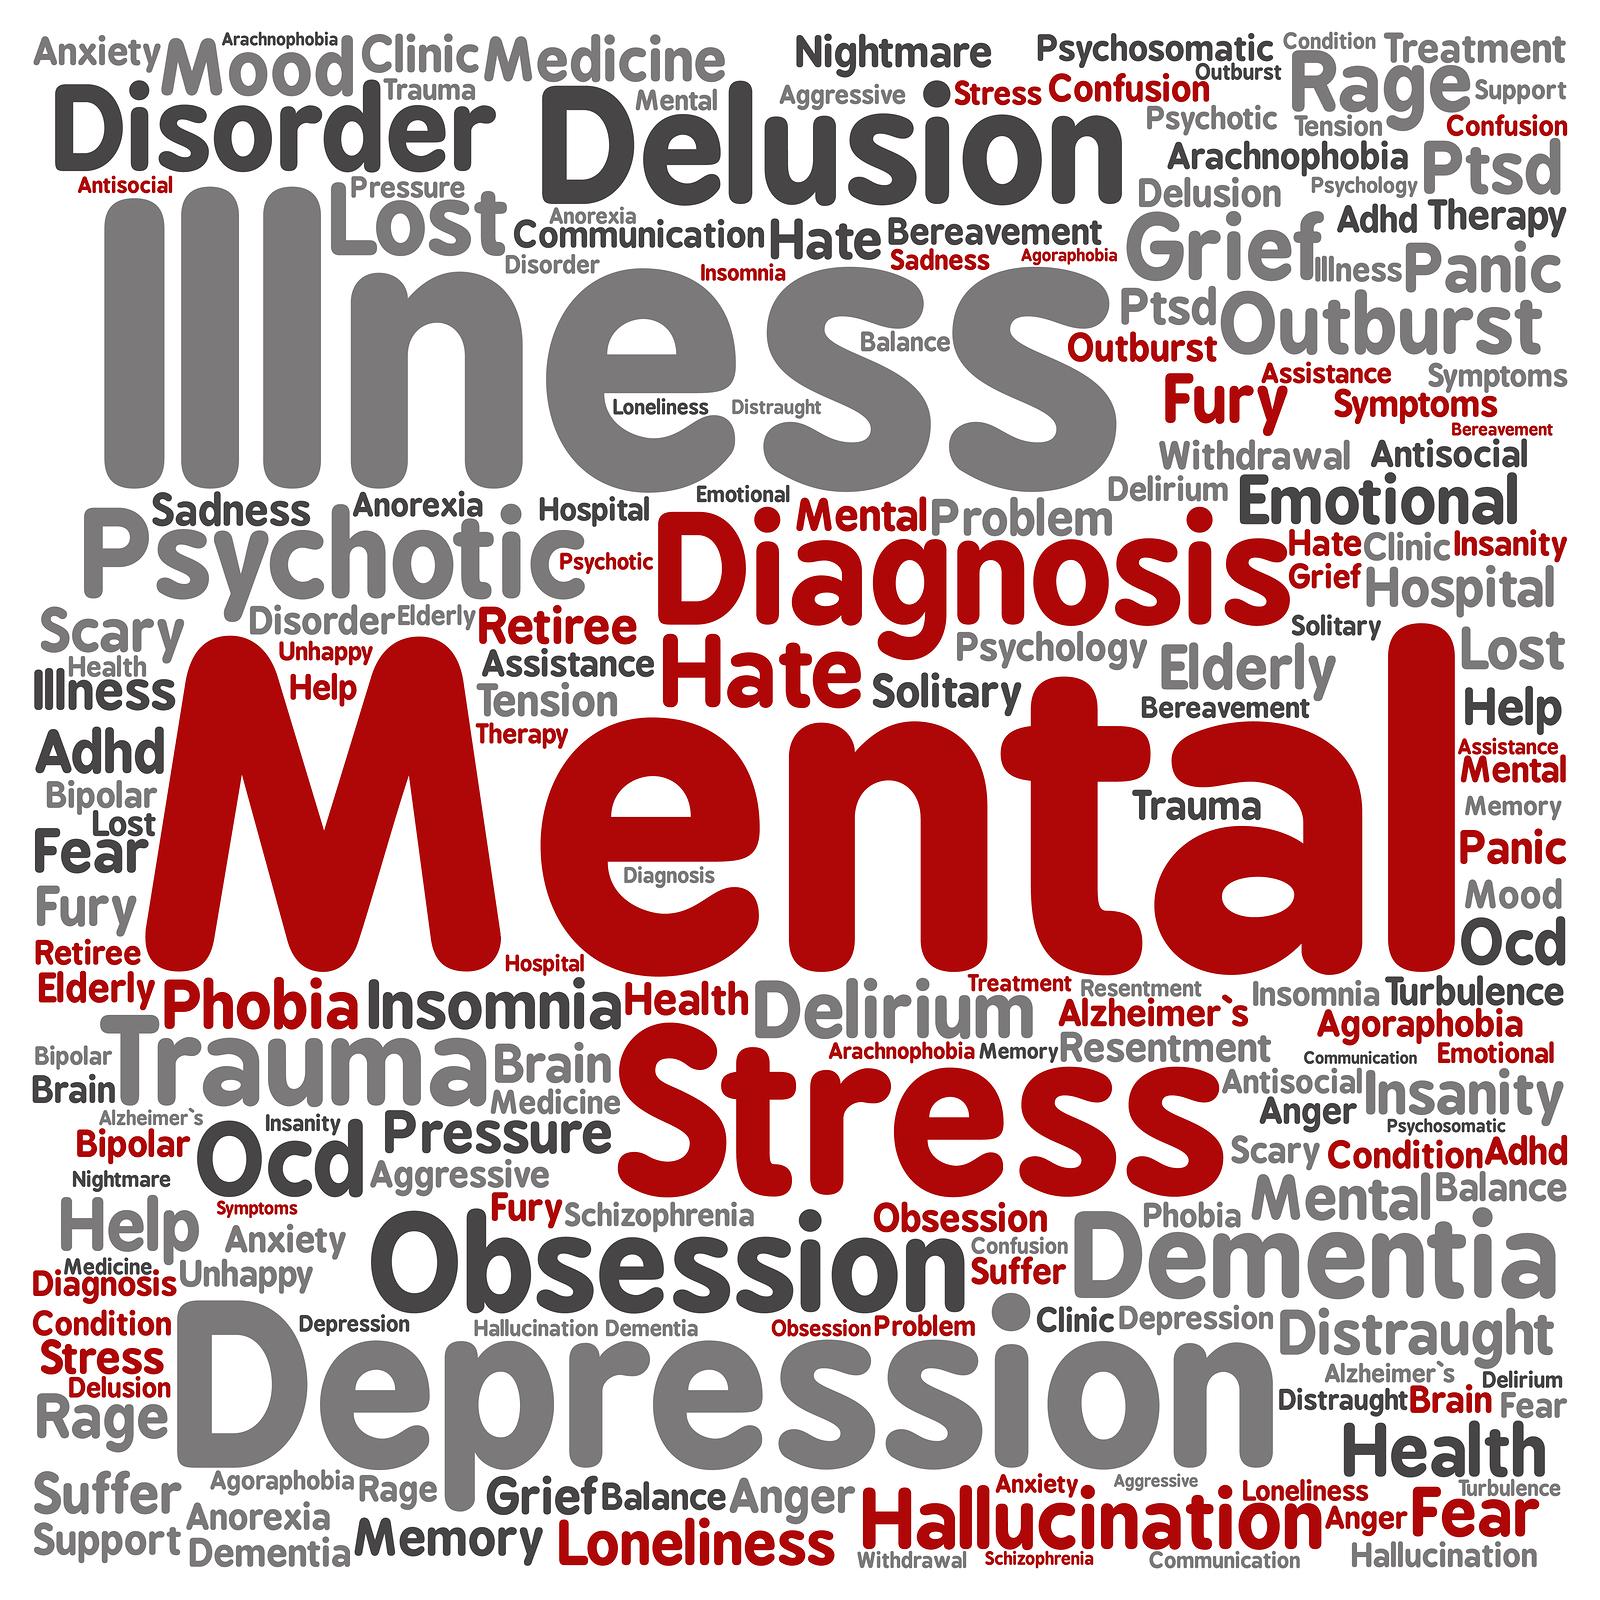 Full Name Disclosure Helps Fight Stigma Of Mental Illness